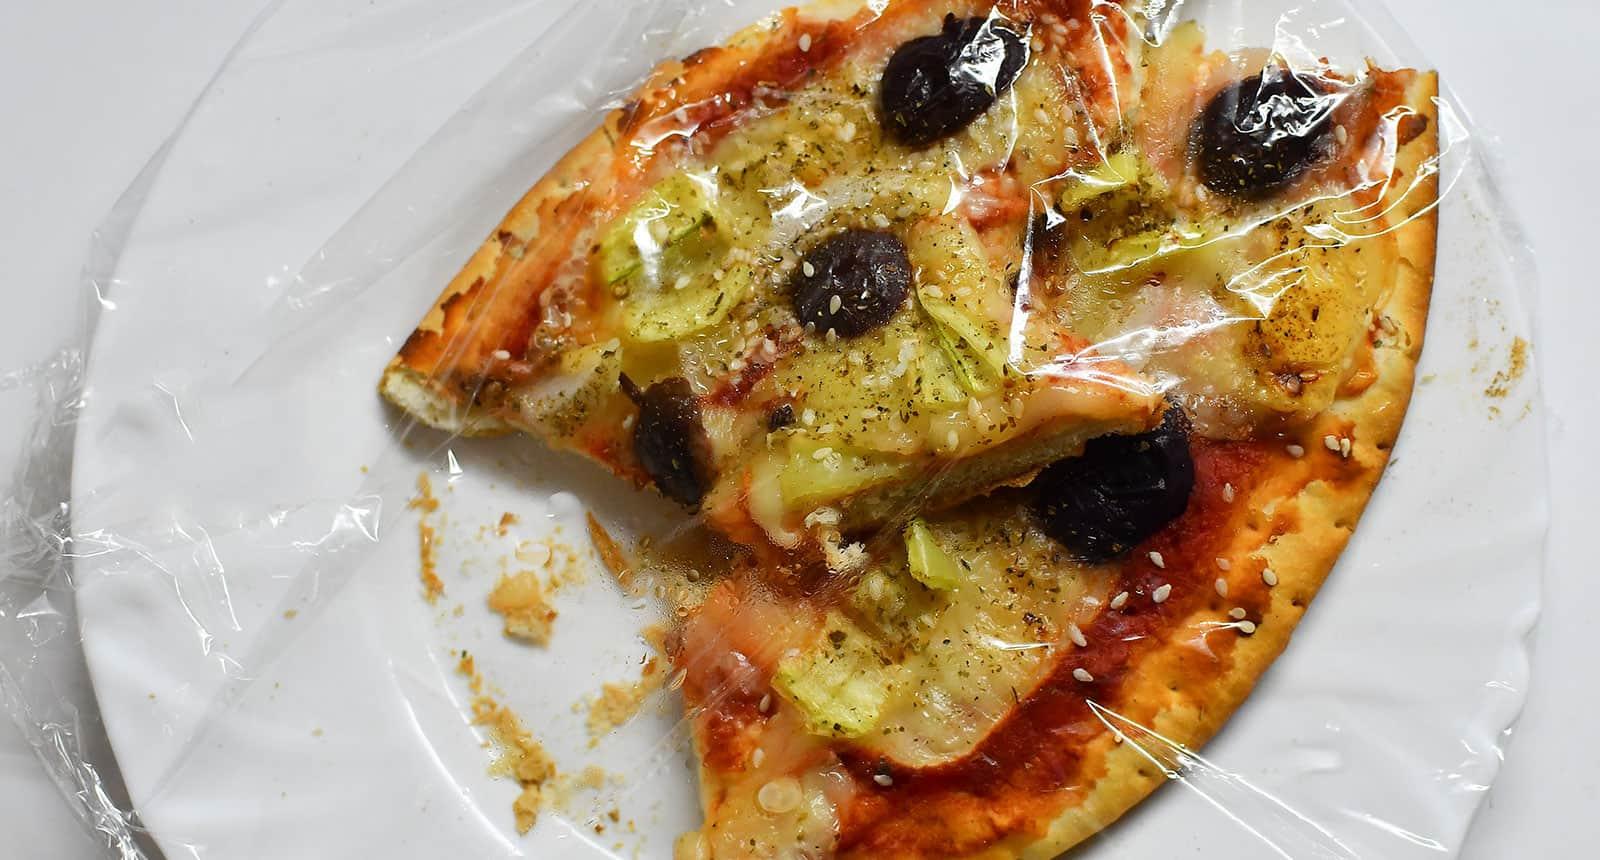 Pizza Leftovers